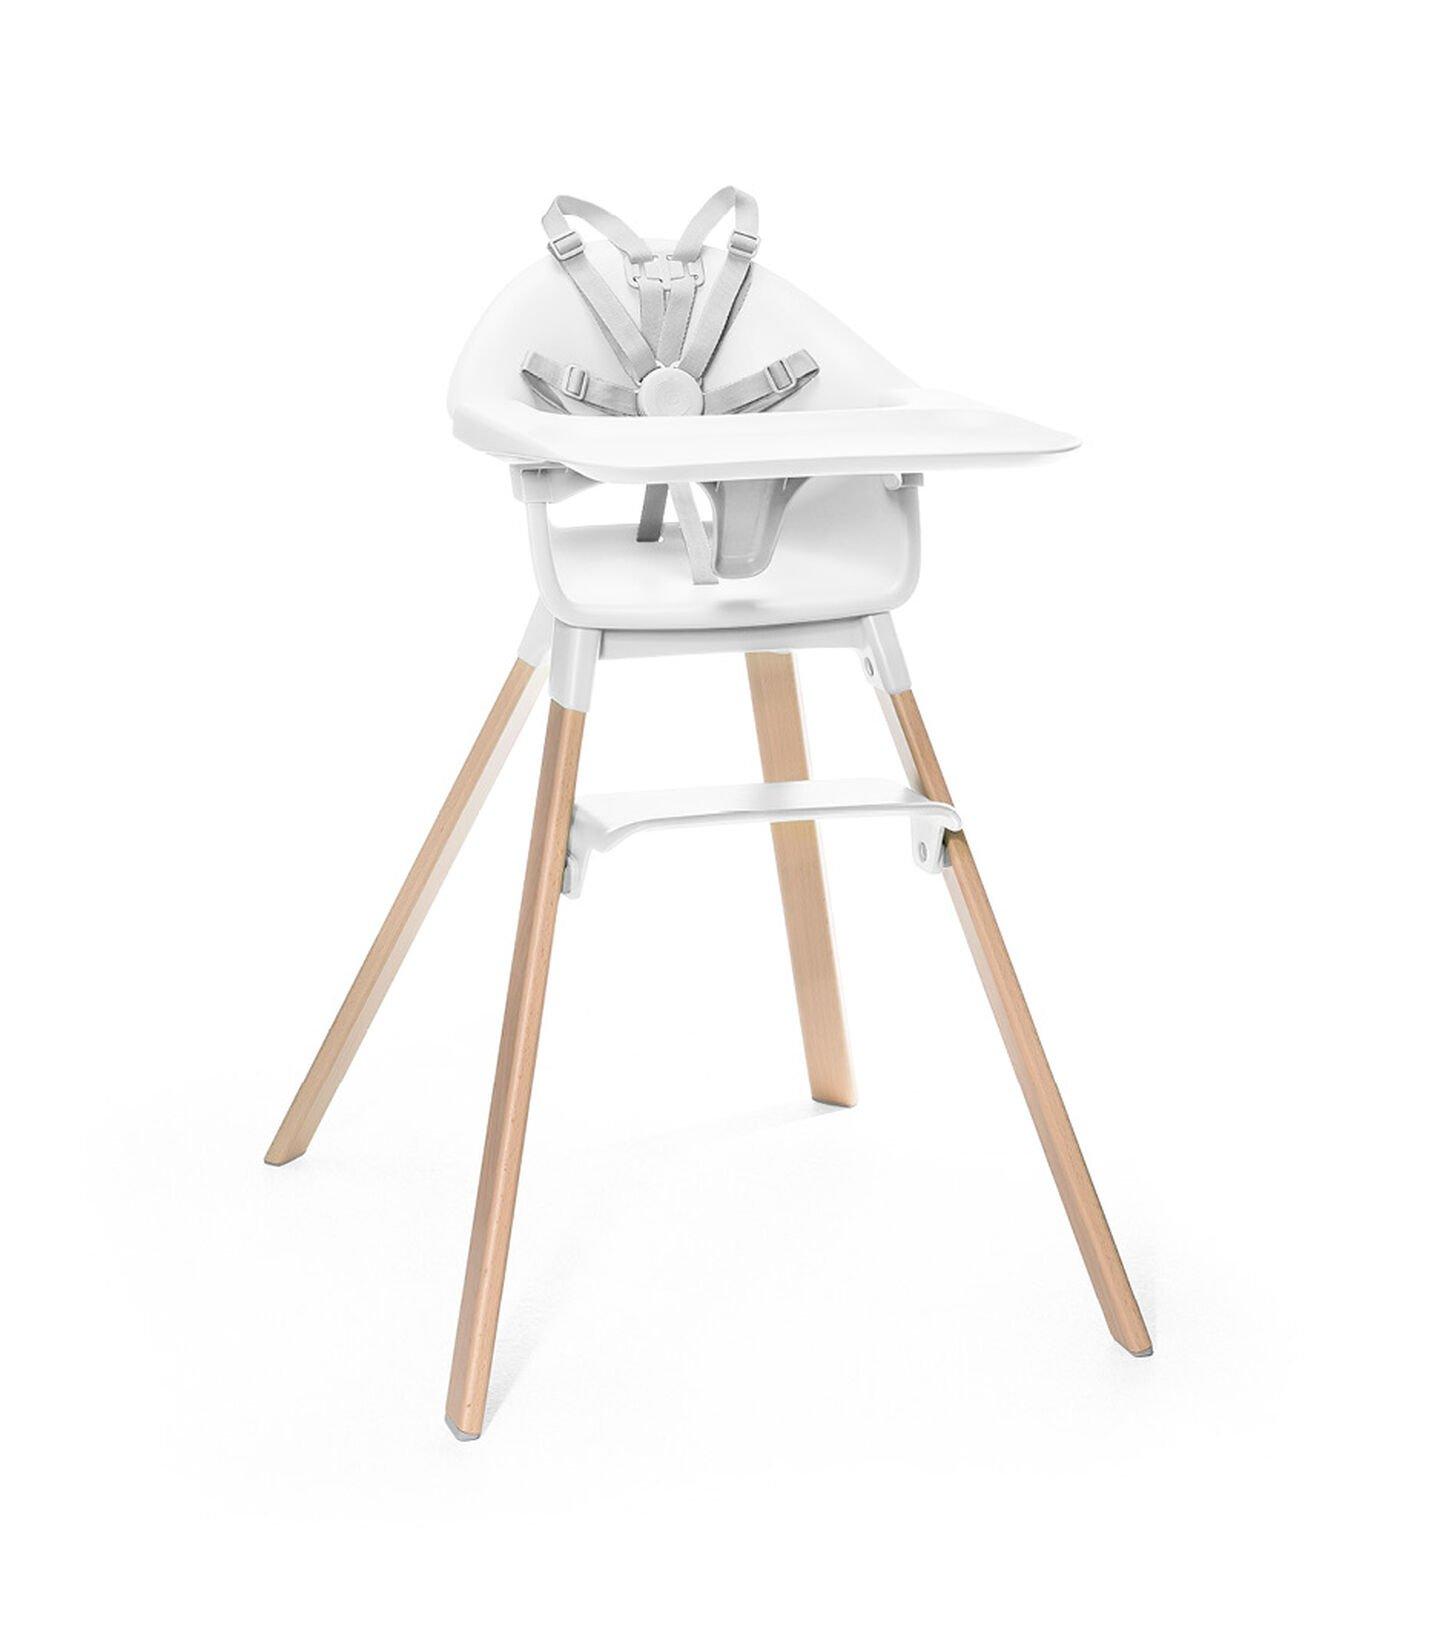 Stokke® Clikk™ High Chair White, White, mainview view 1